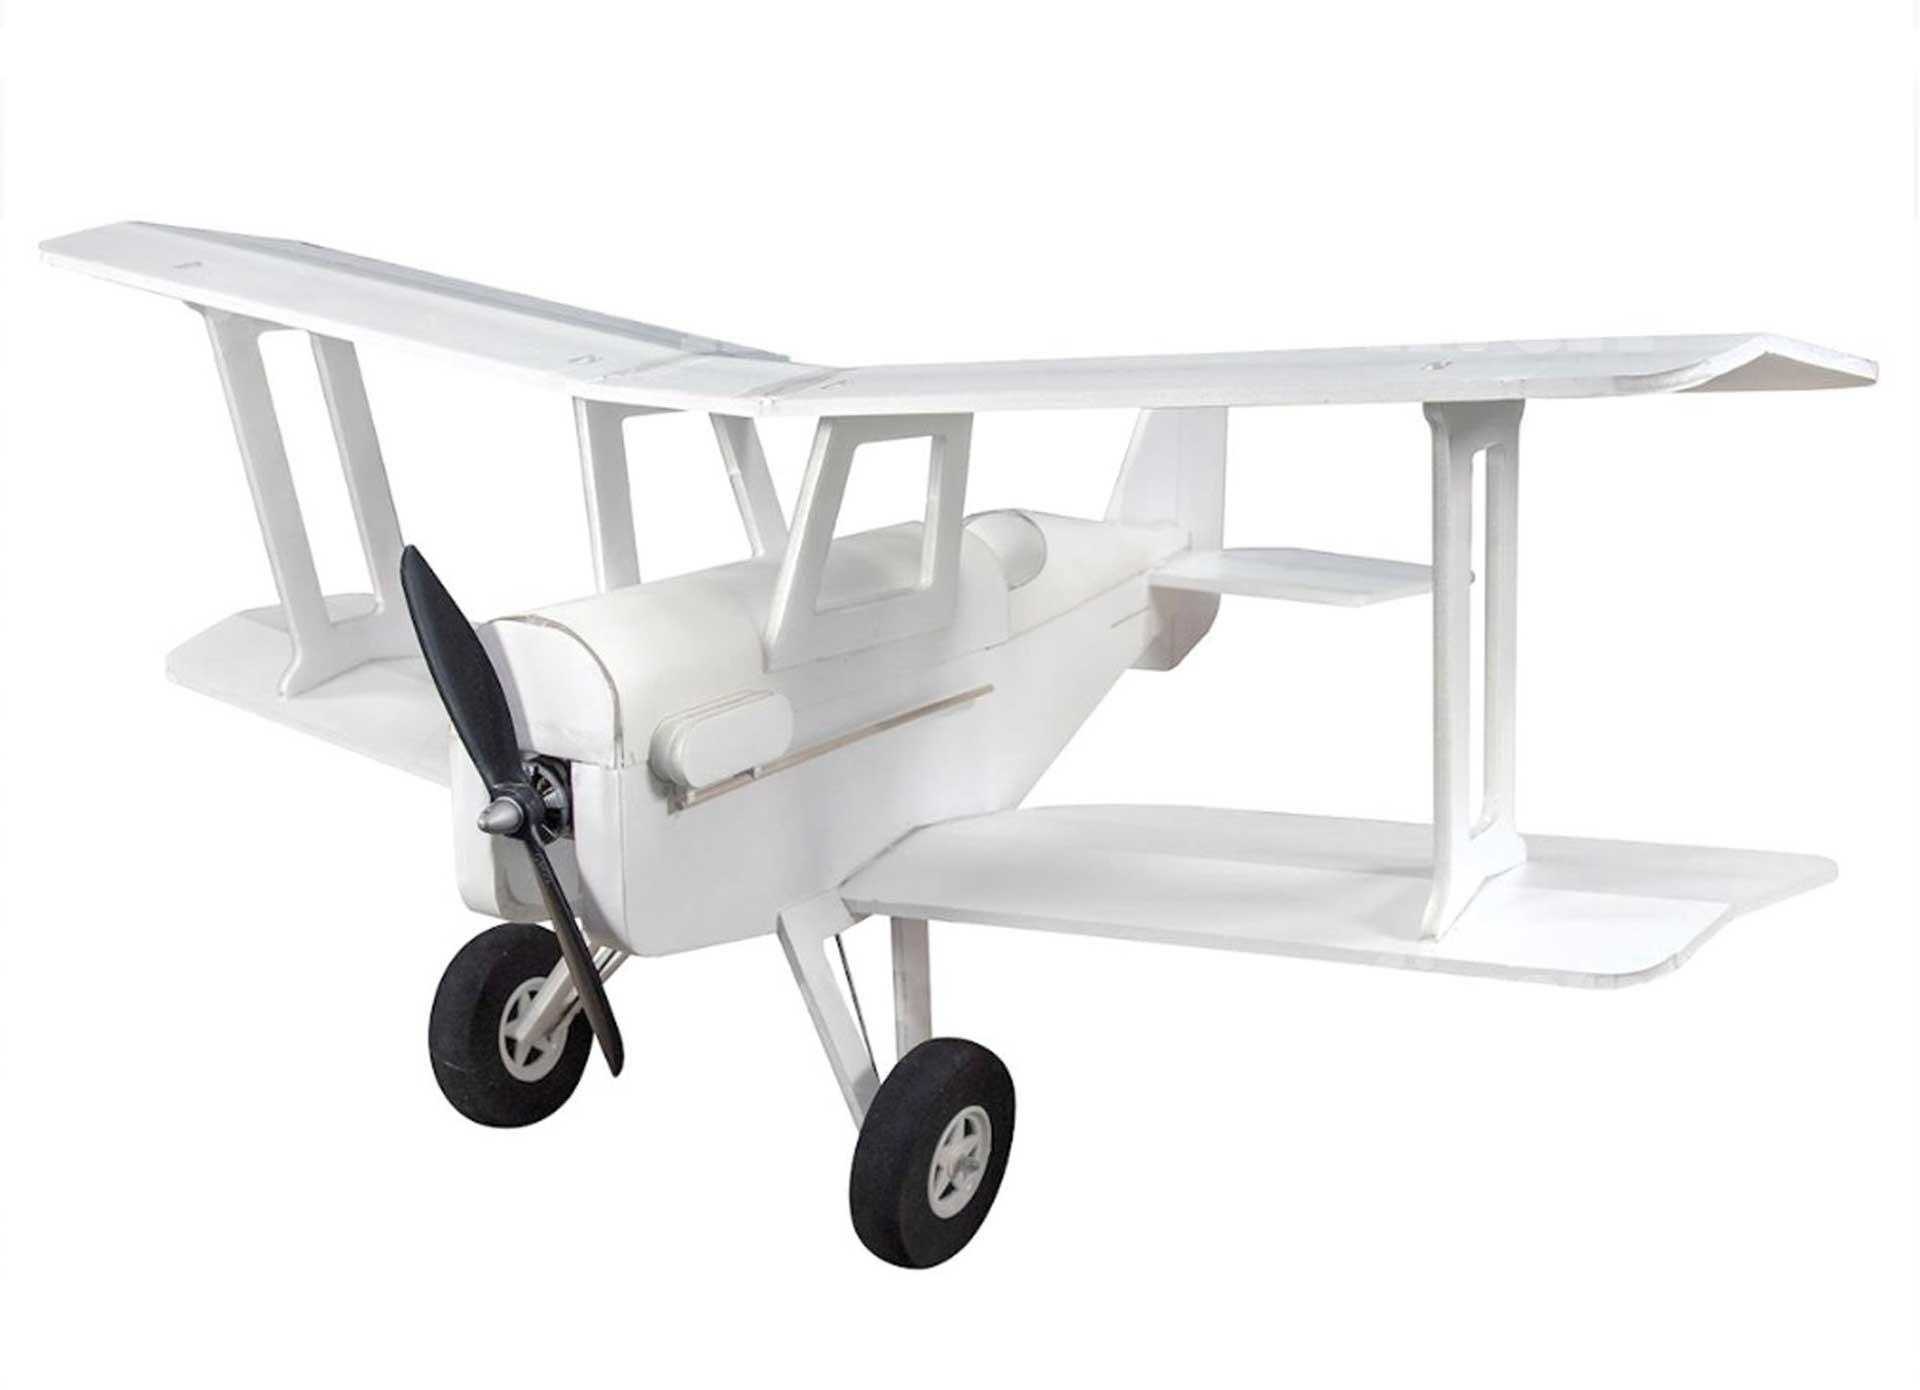 FLITE TEST SE5 Biplane Kit Maker Foam Doppeldecker 609mm